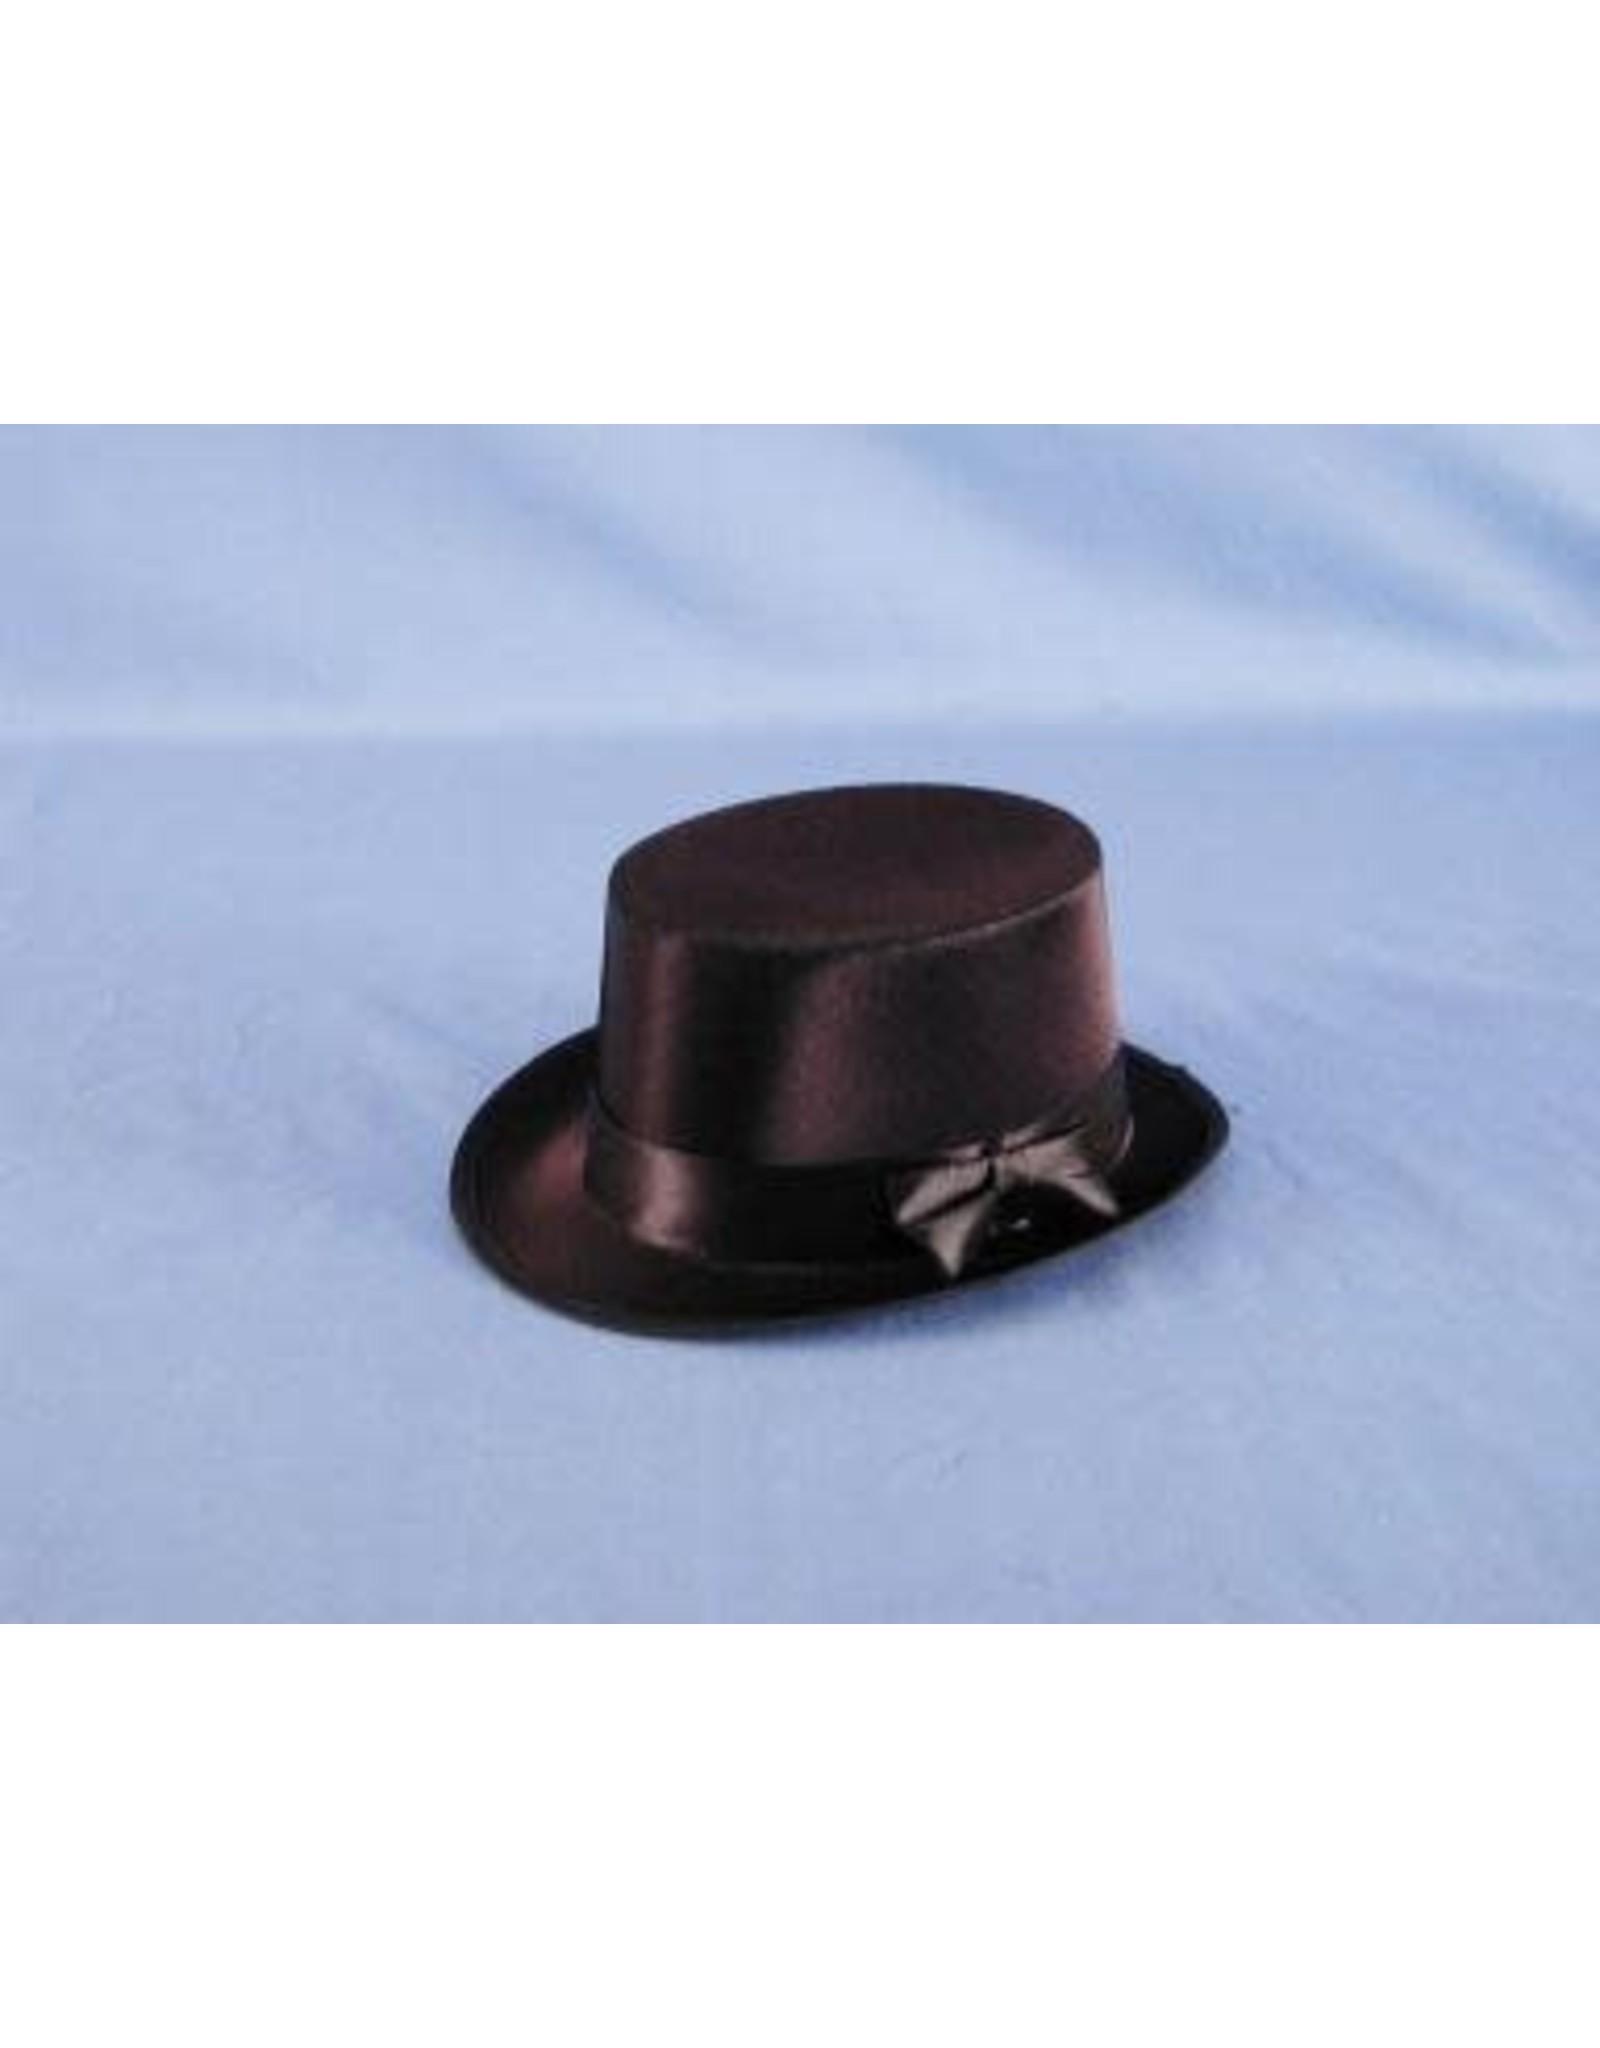 HM Smallwares Black Mini Top Hat